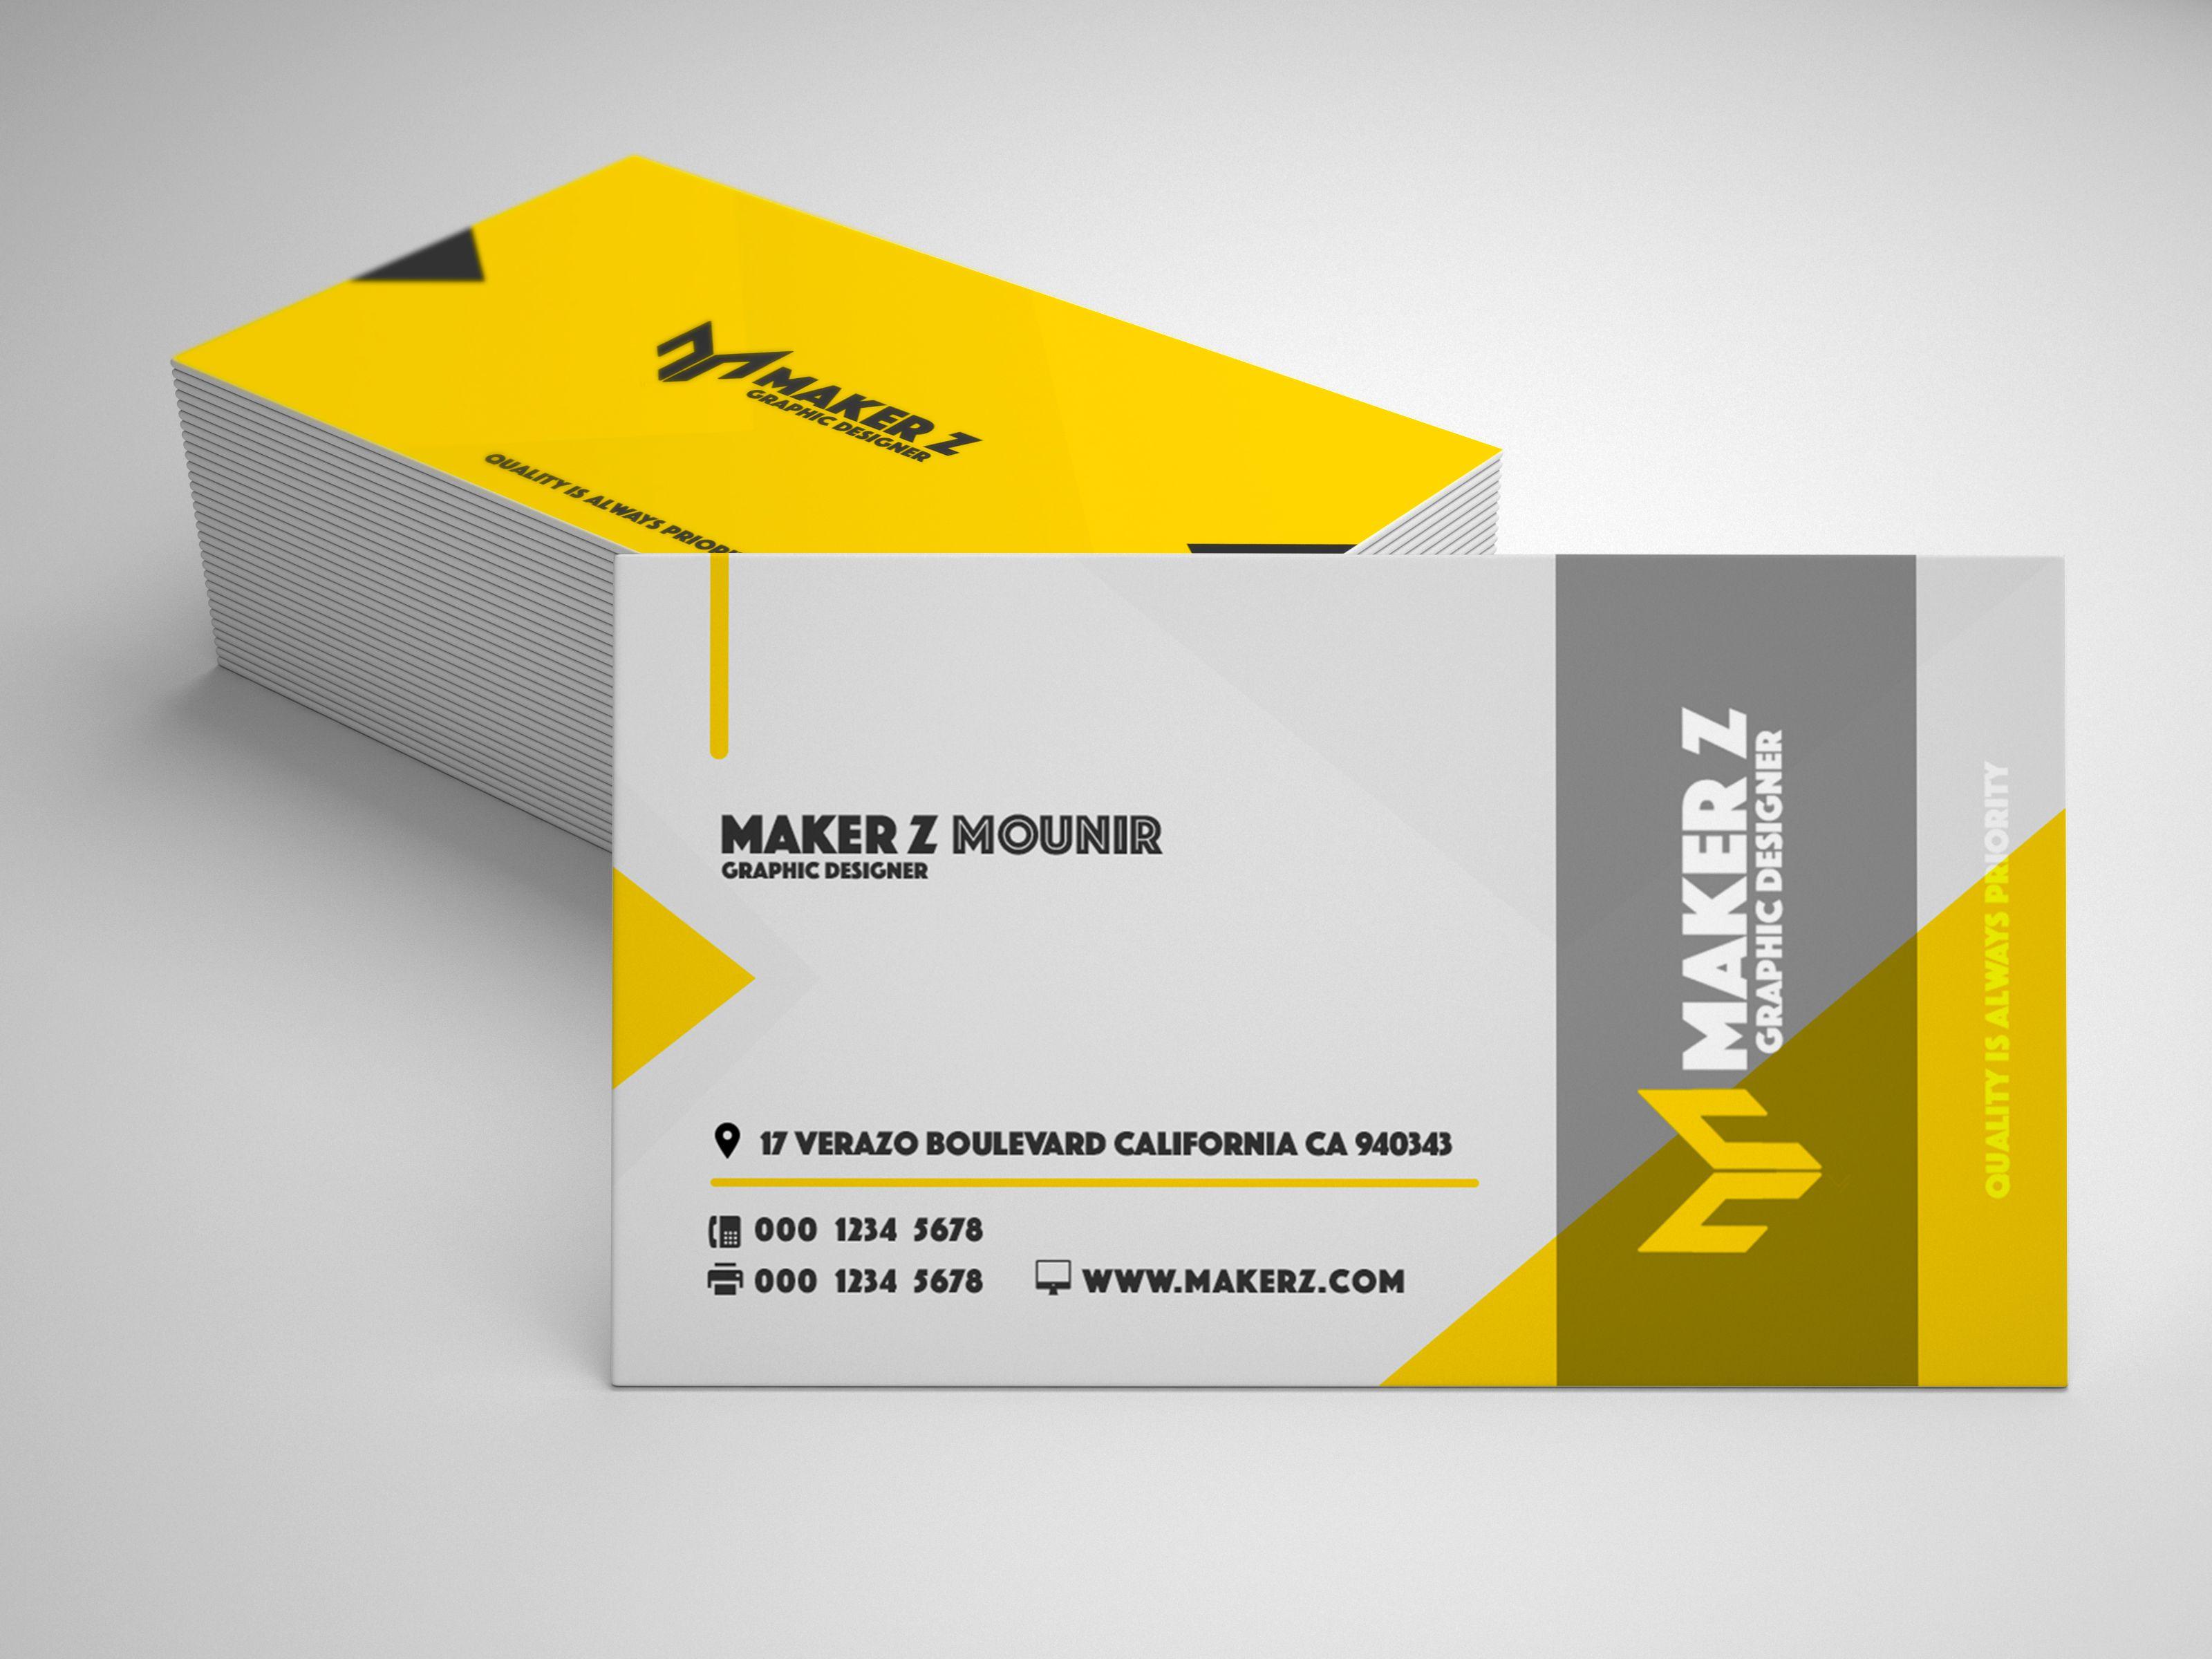 Themakermounir I Will Do 2 Business Card Design Ready For Print For 5 On Fiverr Com Design Business Card Design Card Design